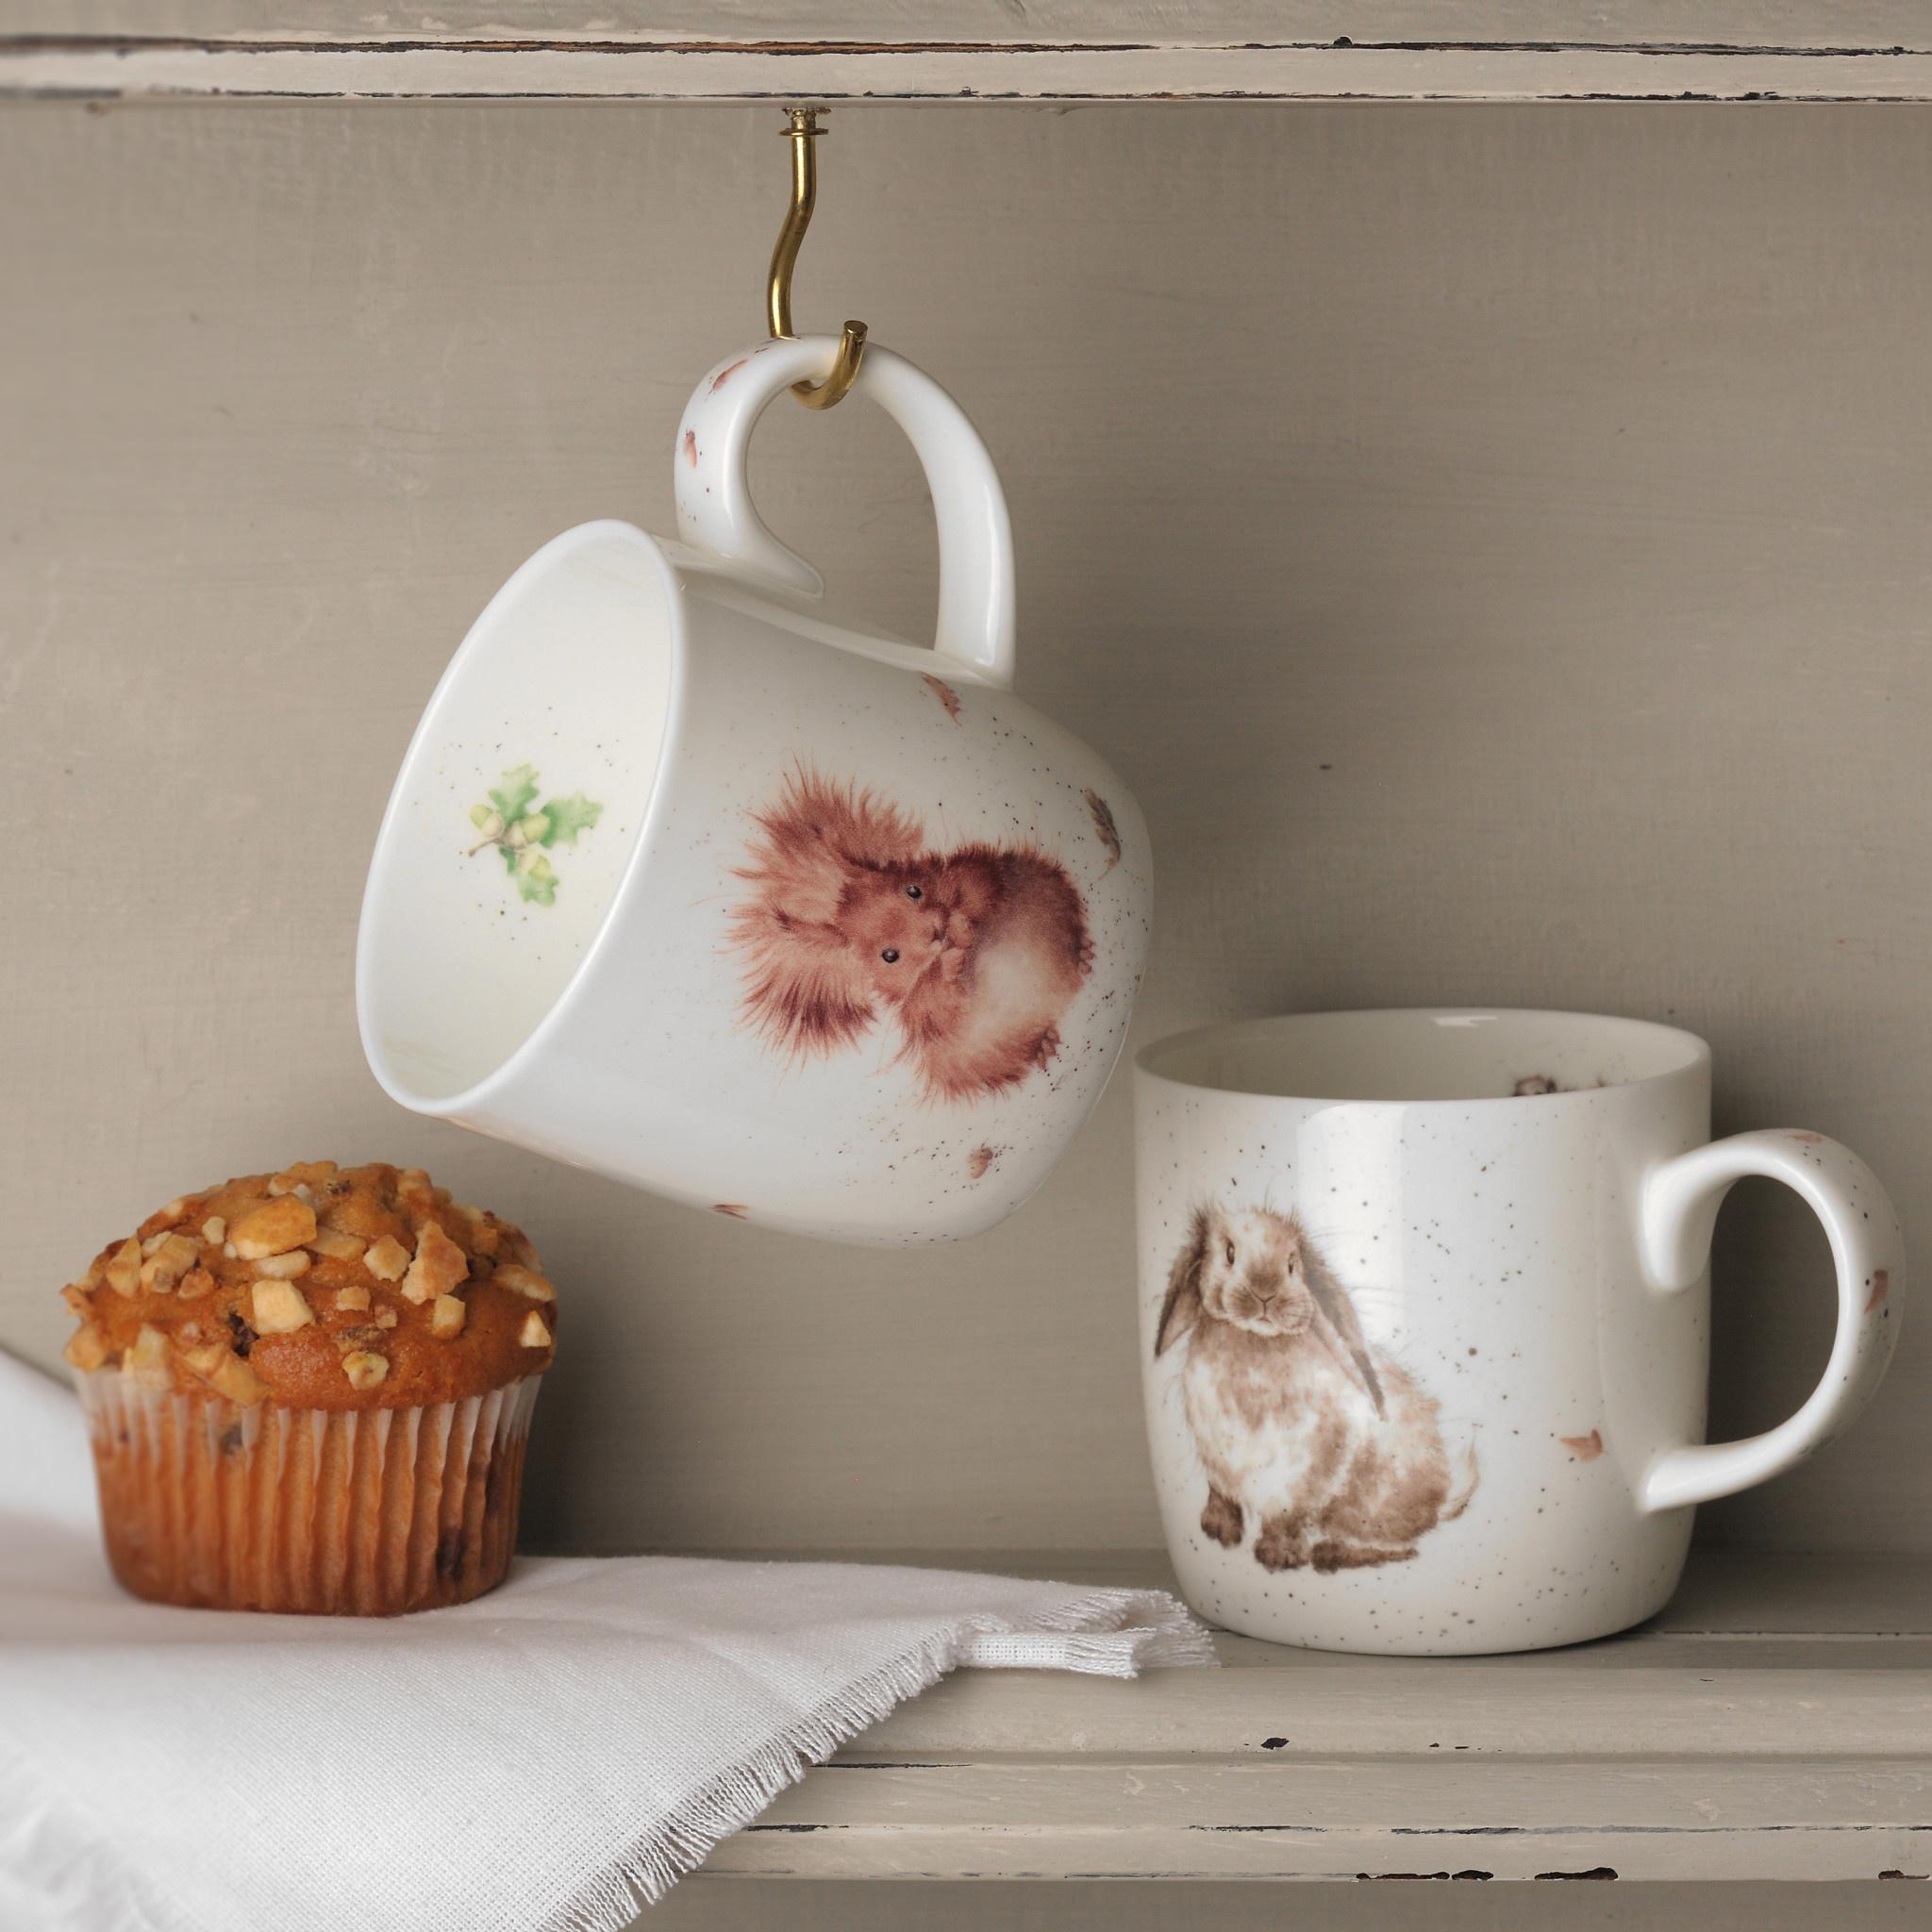 Wrendale Designs 'Treetops Redhead' Mug